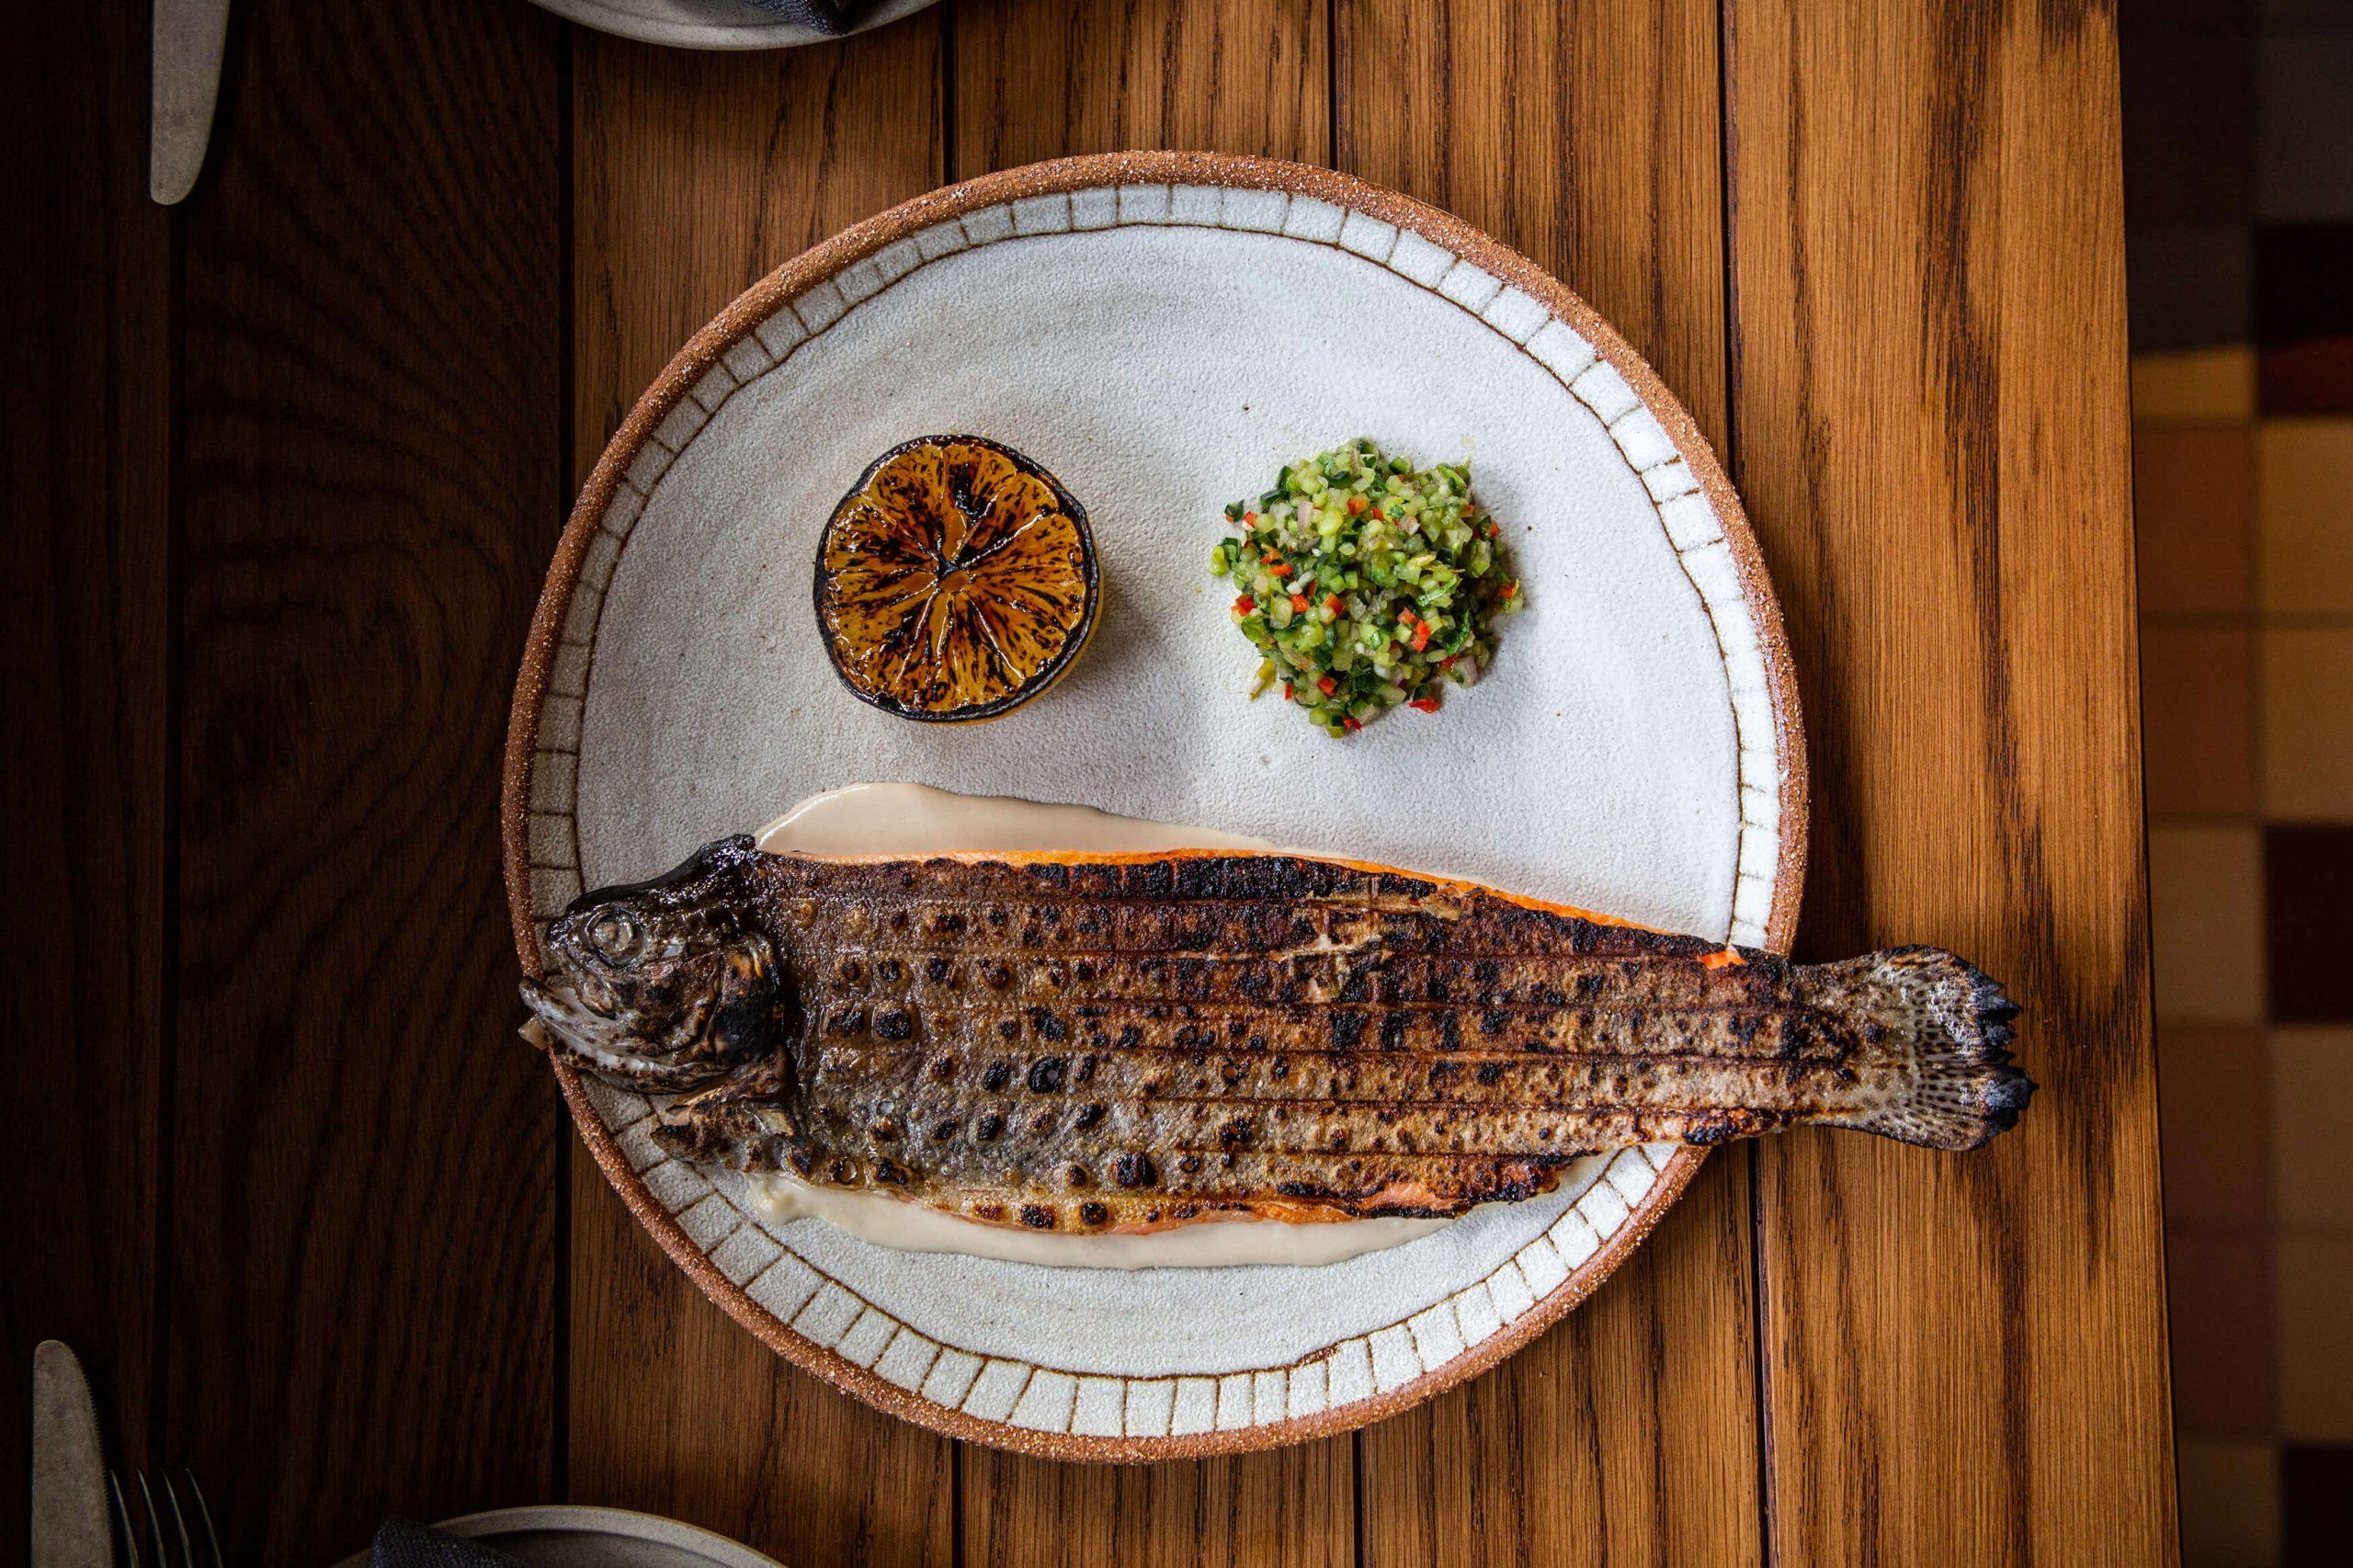 Ovolo Za Za Ta Hospitality Visual Identity - Grilledd fish food photograph